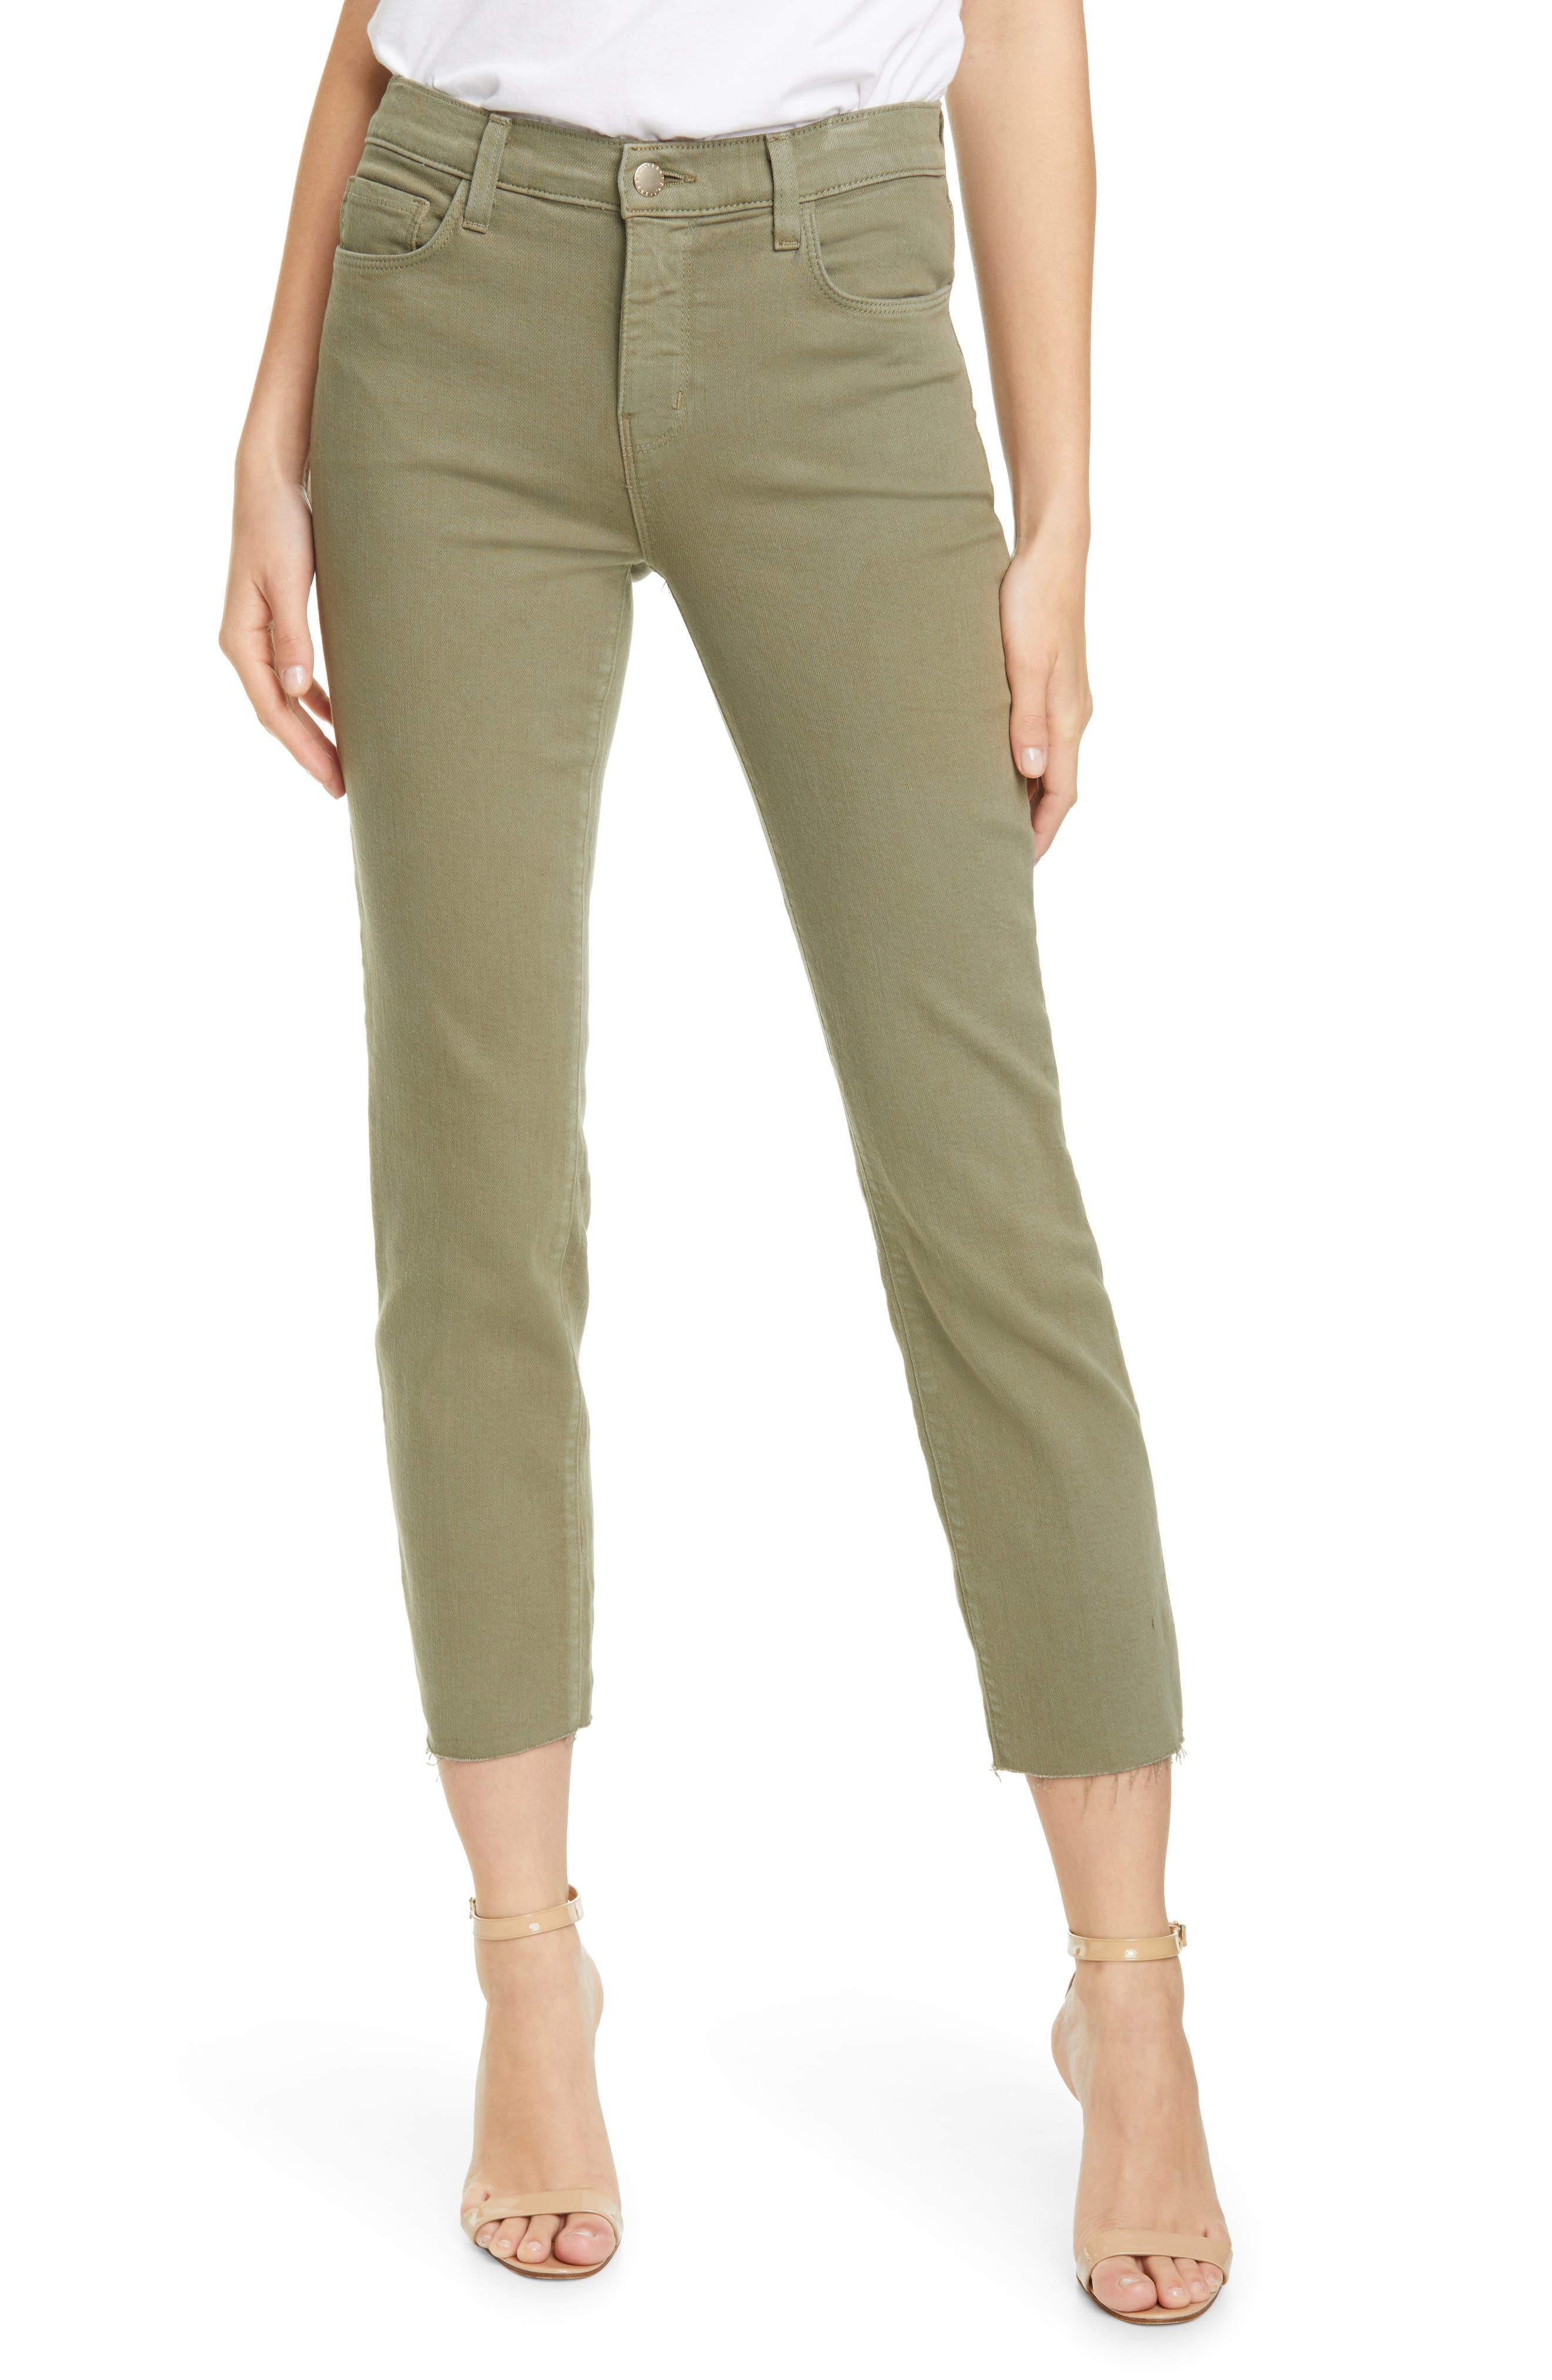 L Agence Women's Sada High-rise Crop Slim Straight Jeans In Basil